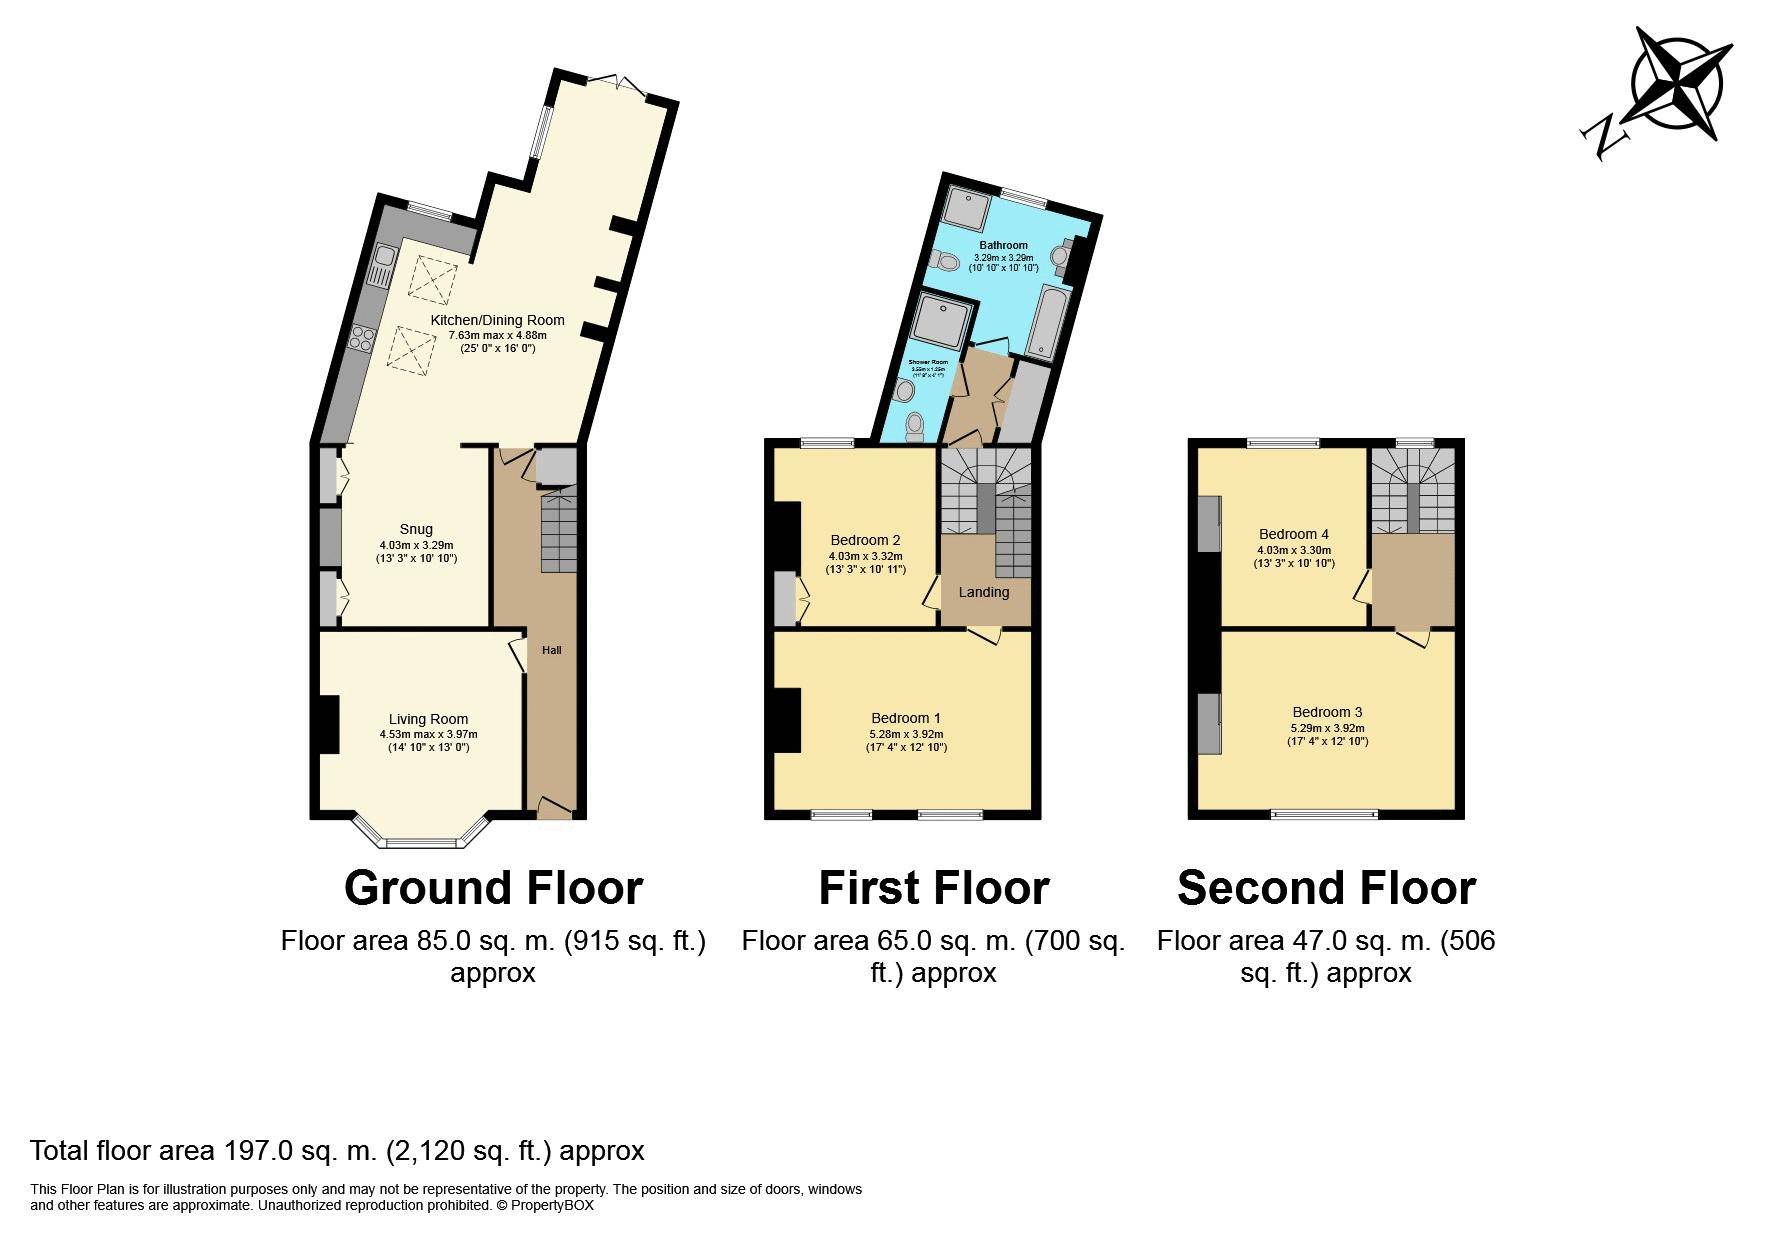 99 Old Tiverton Rd Floorplan